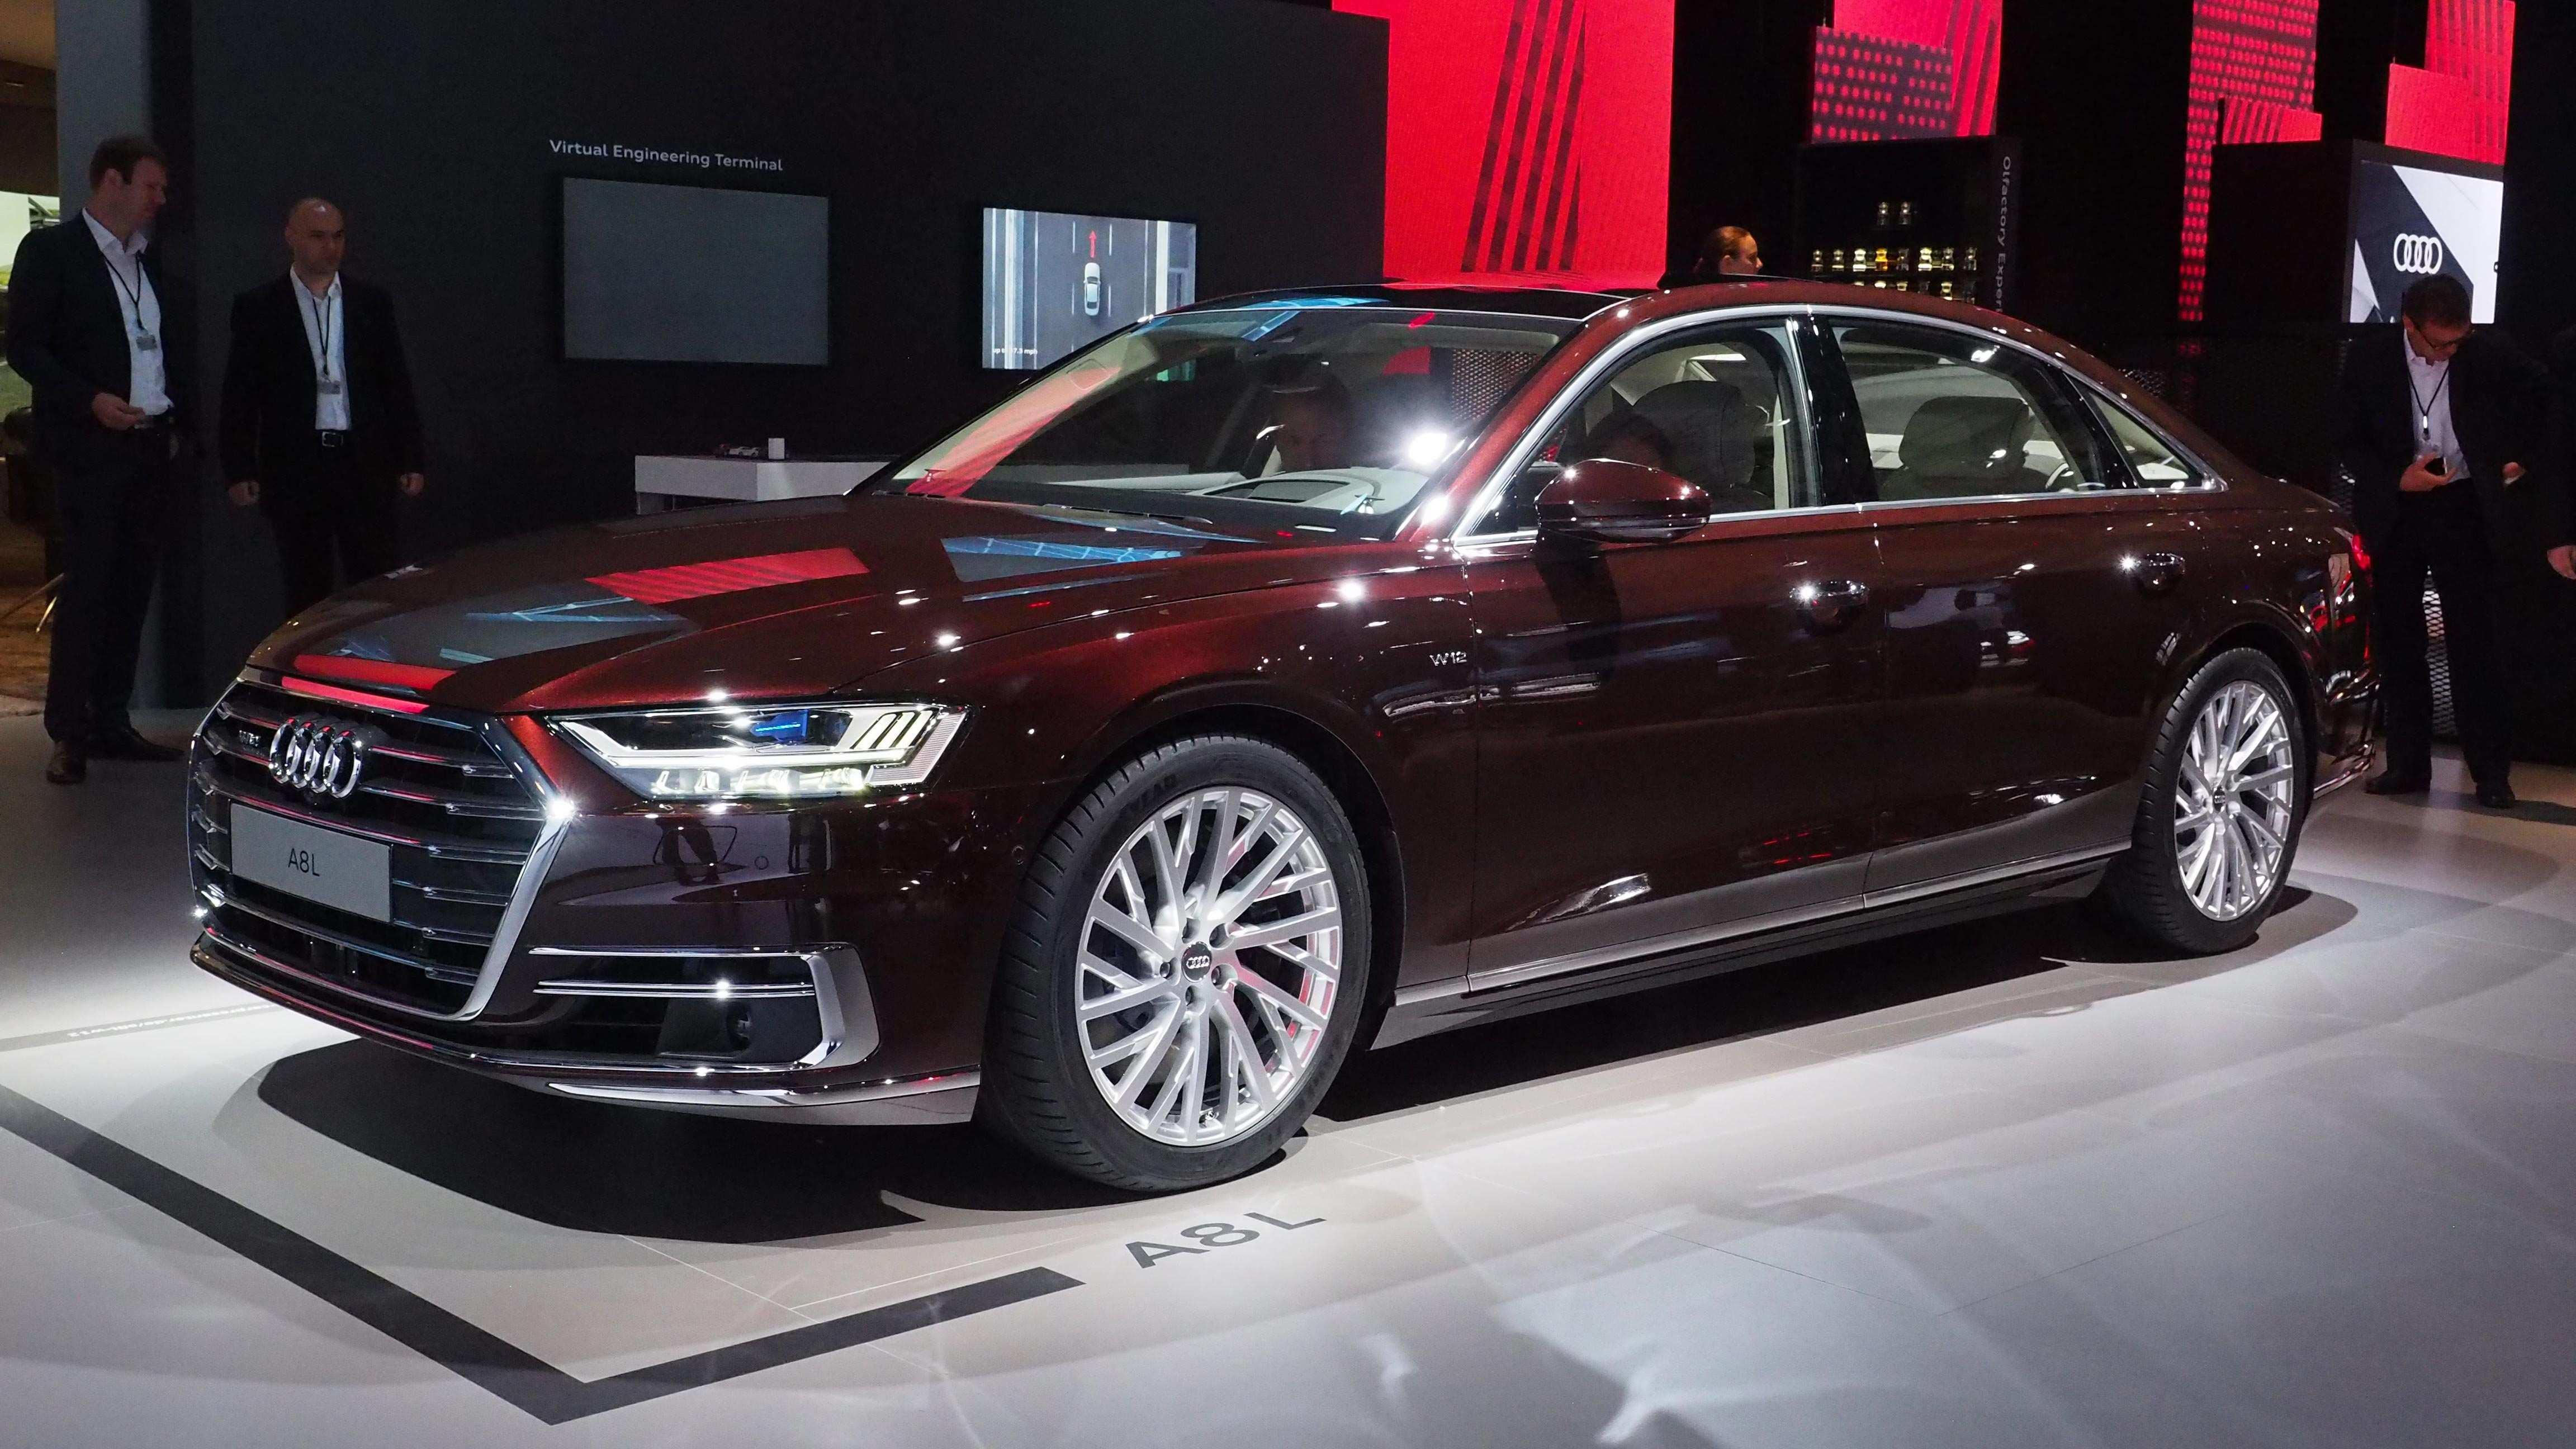 19 New 2019 Audi A8 L History by 2019 Audi A8 L